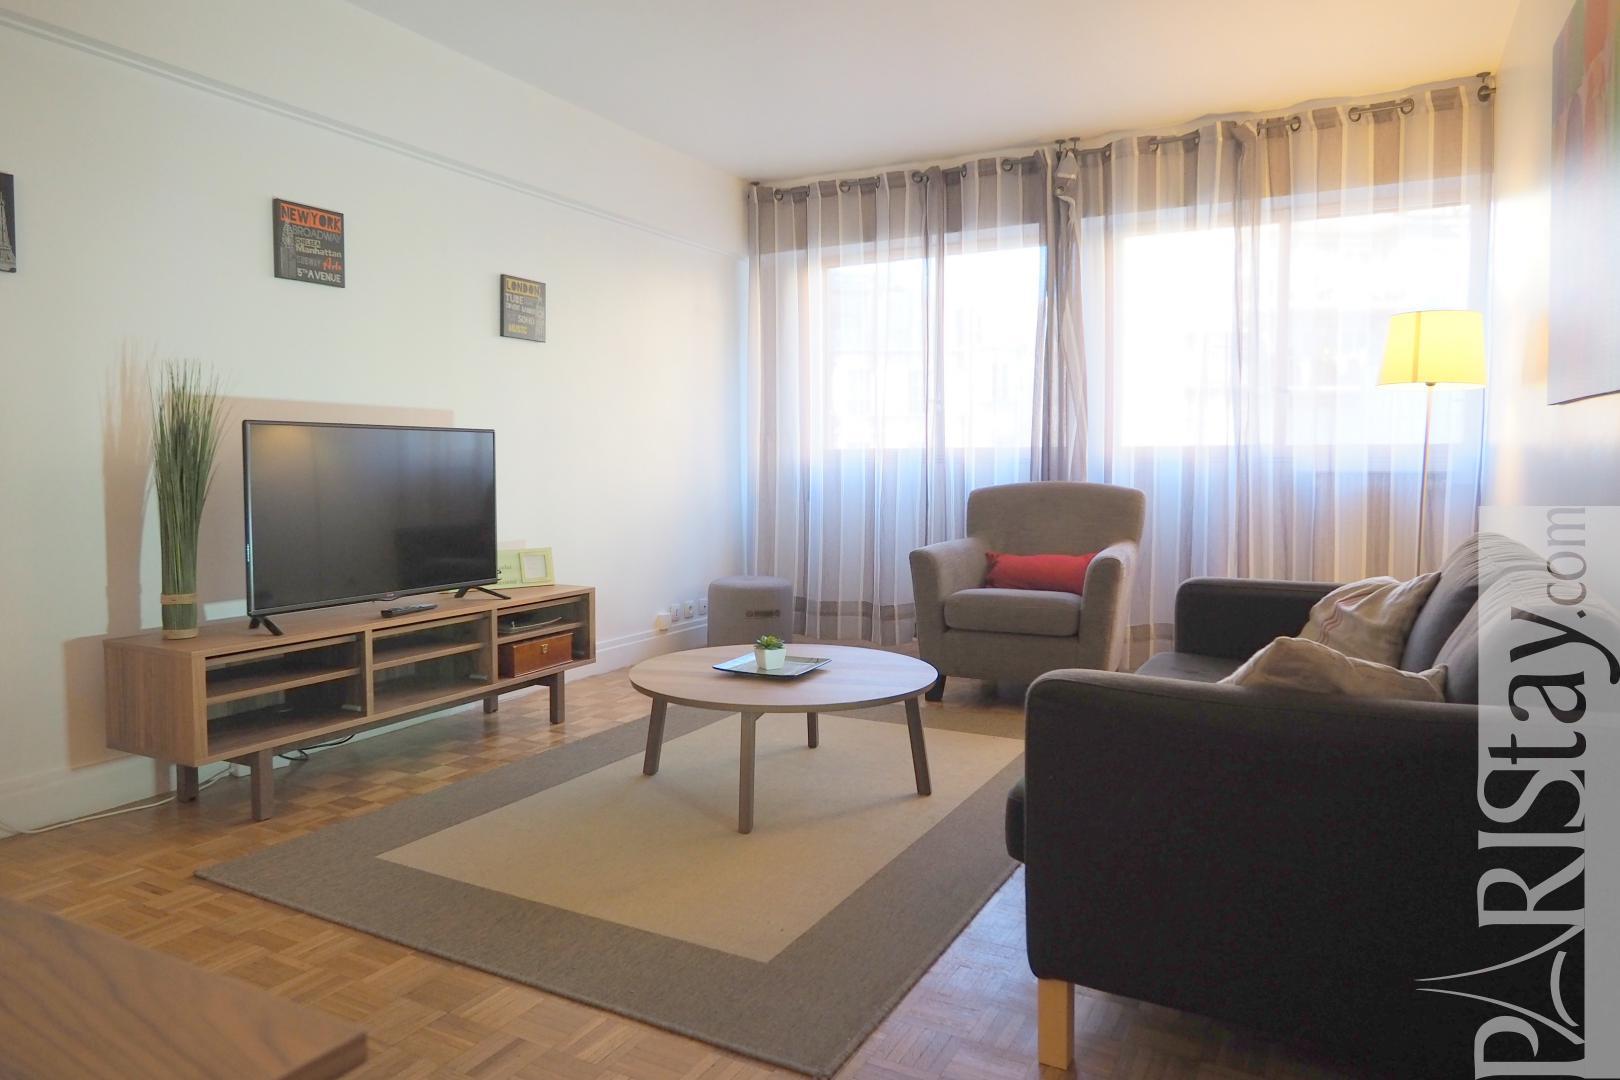 Apartment for rent in paris france 75016 paris 1 bedroom